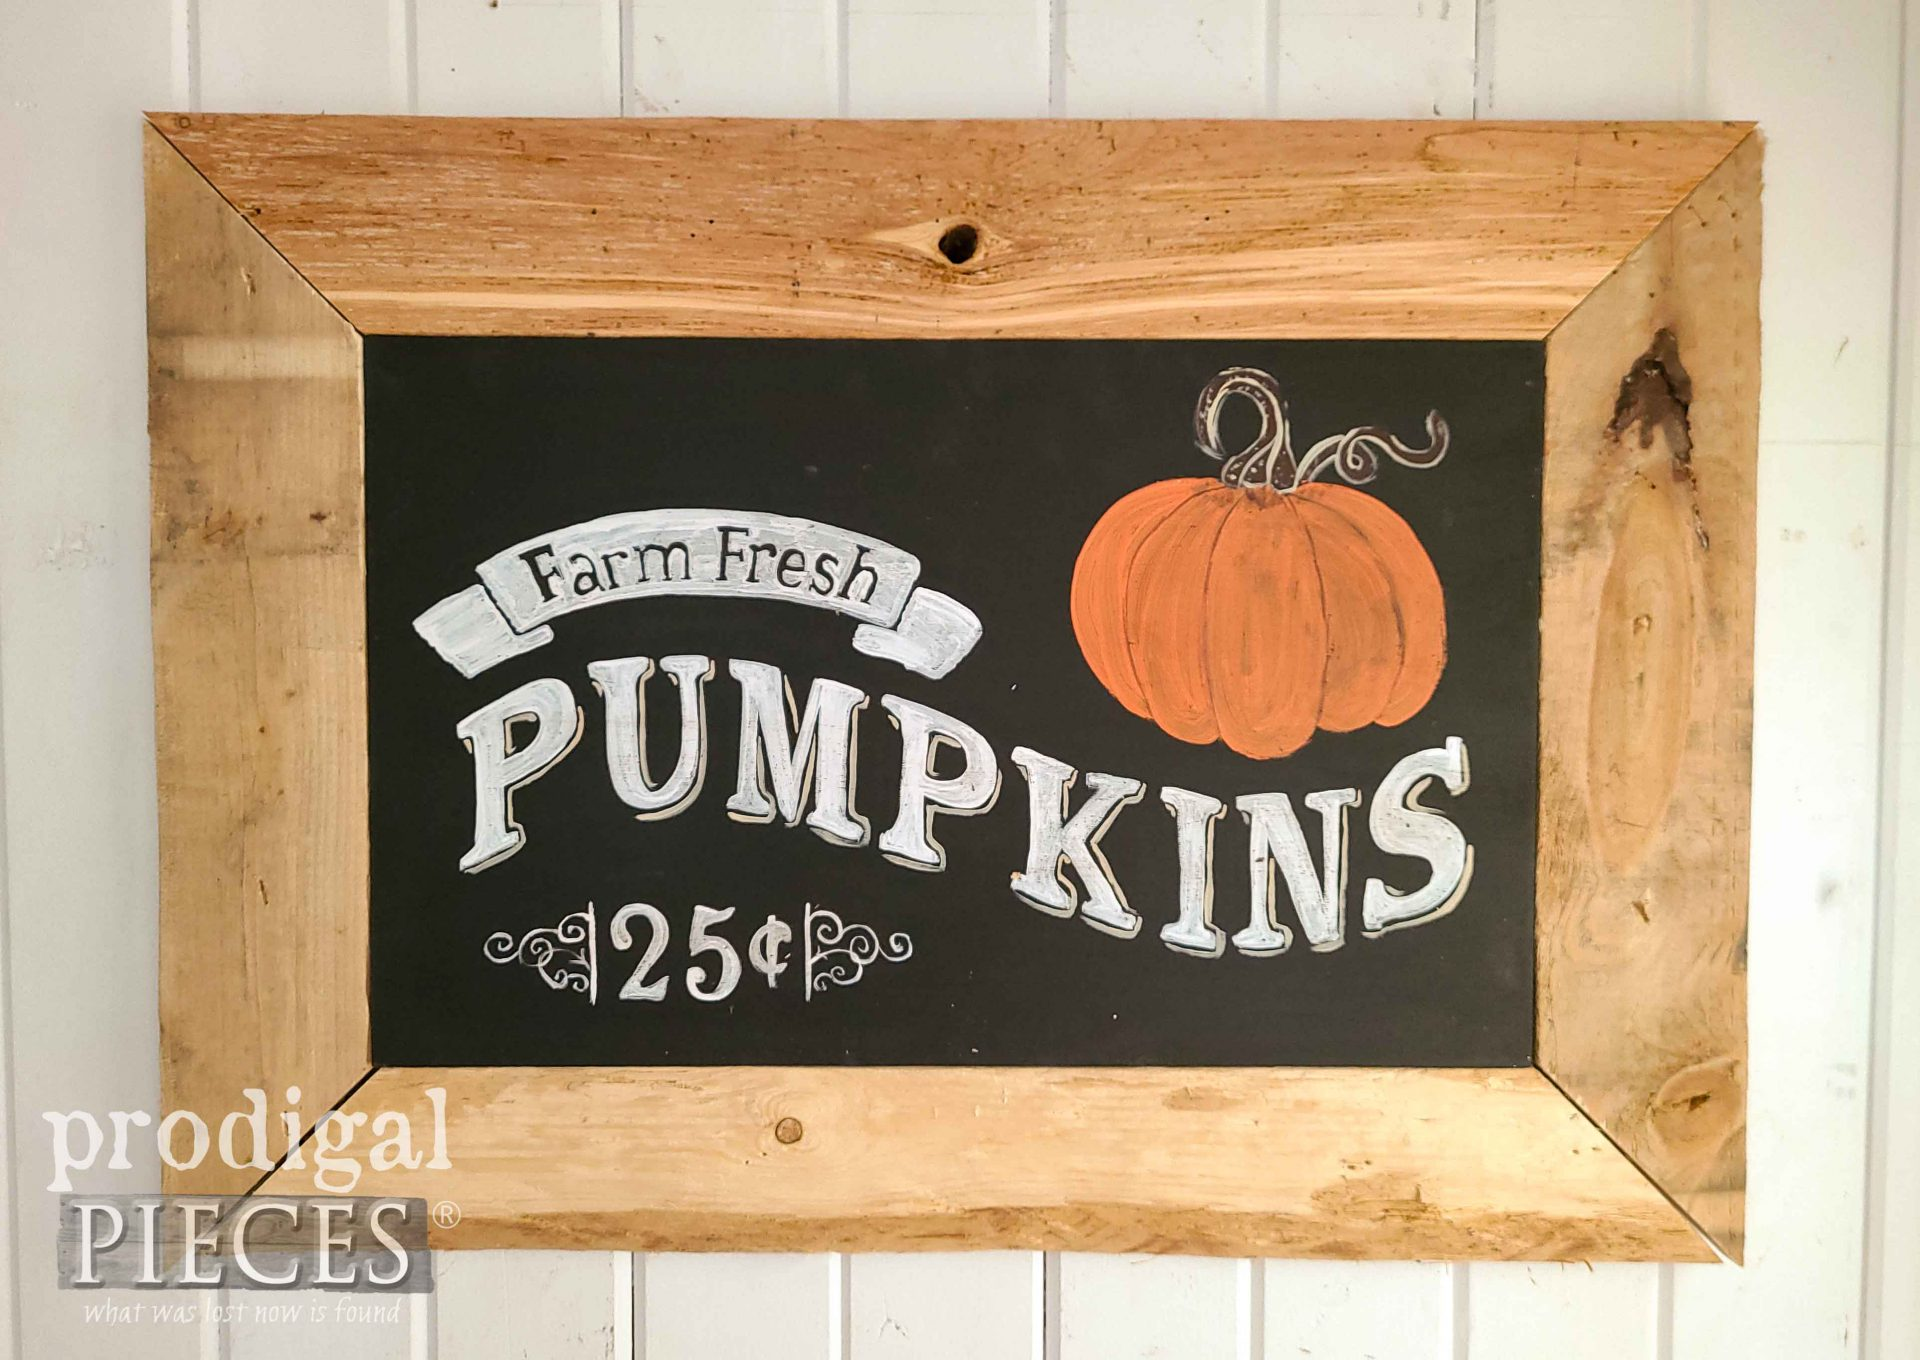 DIY Harvest Sign with Pumpkin Tutorial by Larissa of Prodigal Pieces | prodigalpieces.com #prodigalpieces #diy #farmhouse #fall #home #homedecor